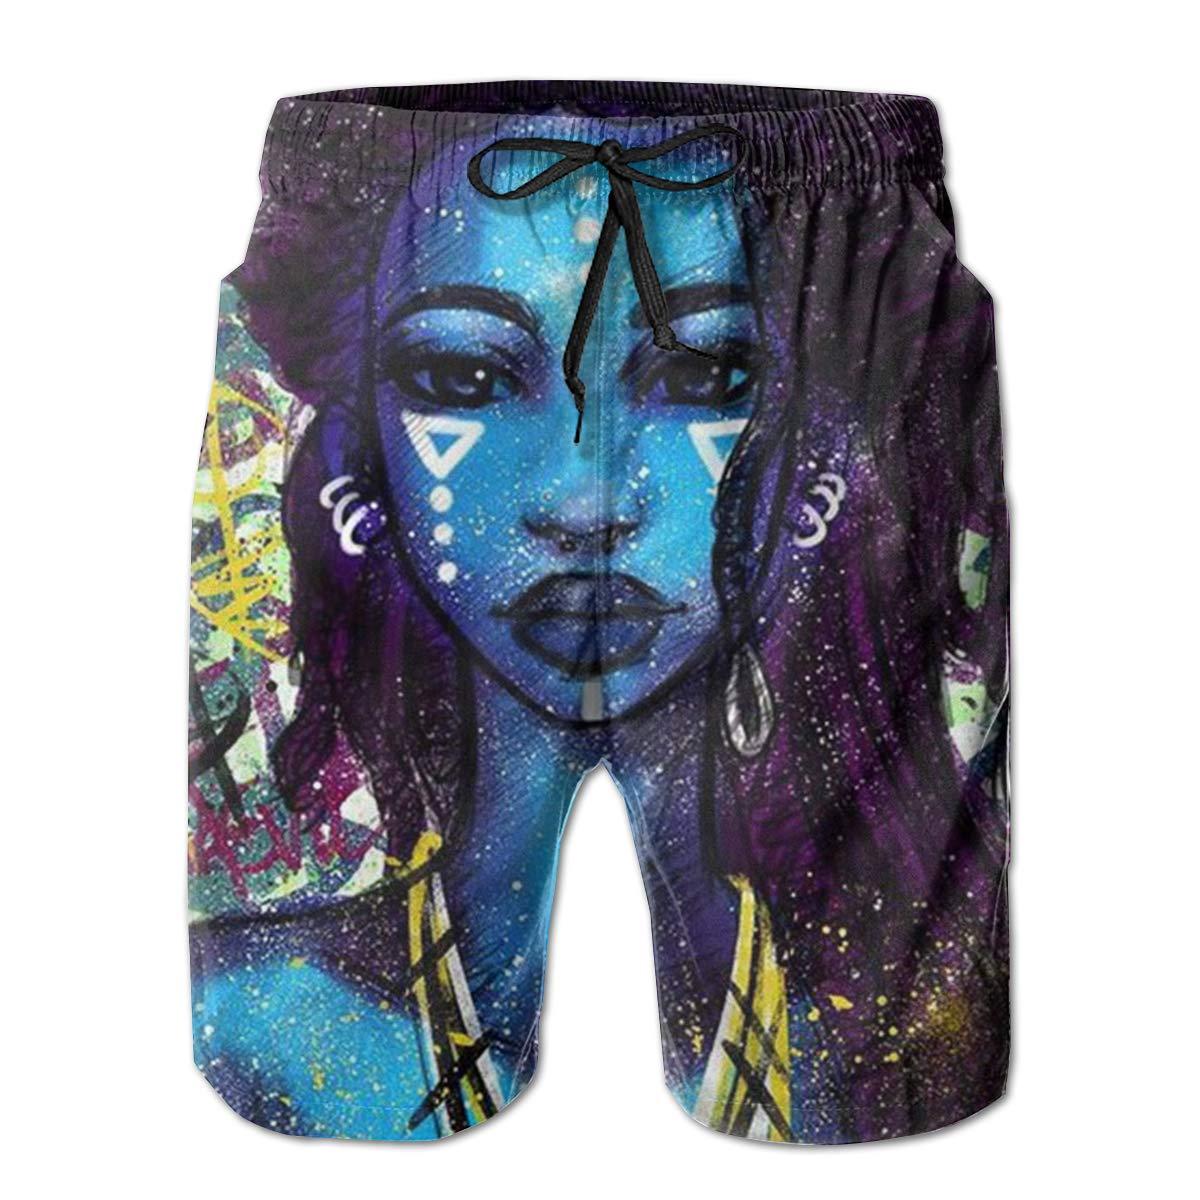 SARA NELL Mens Swim Trunks African American Women Black Art Graffiti Surfing Beach Board Shorts Swimwear